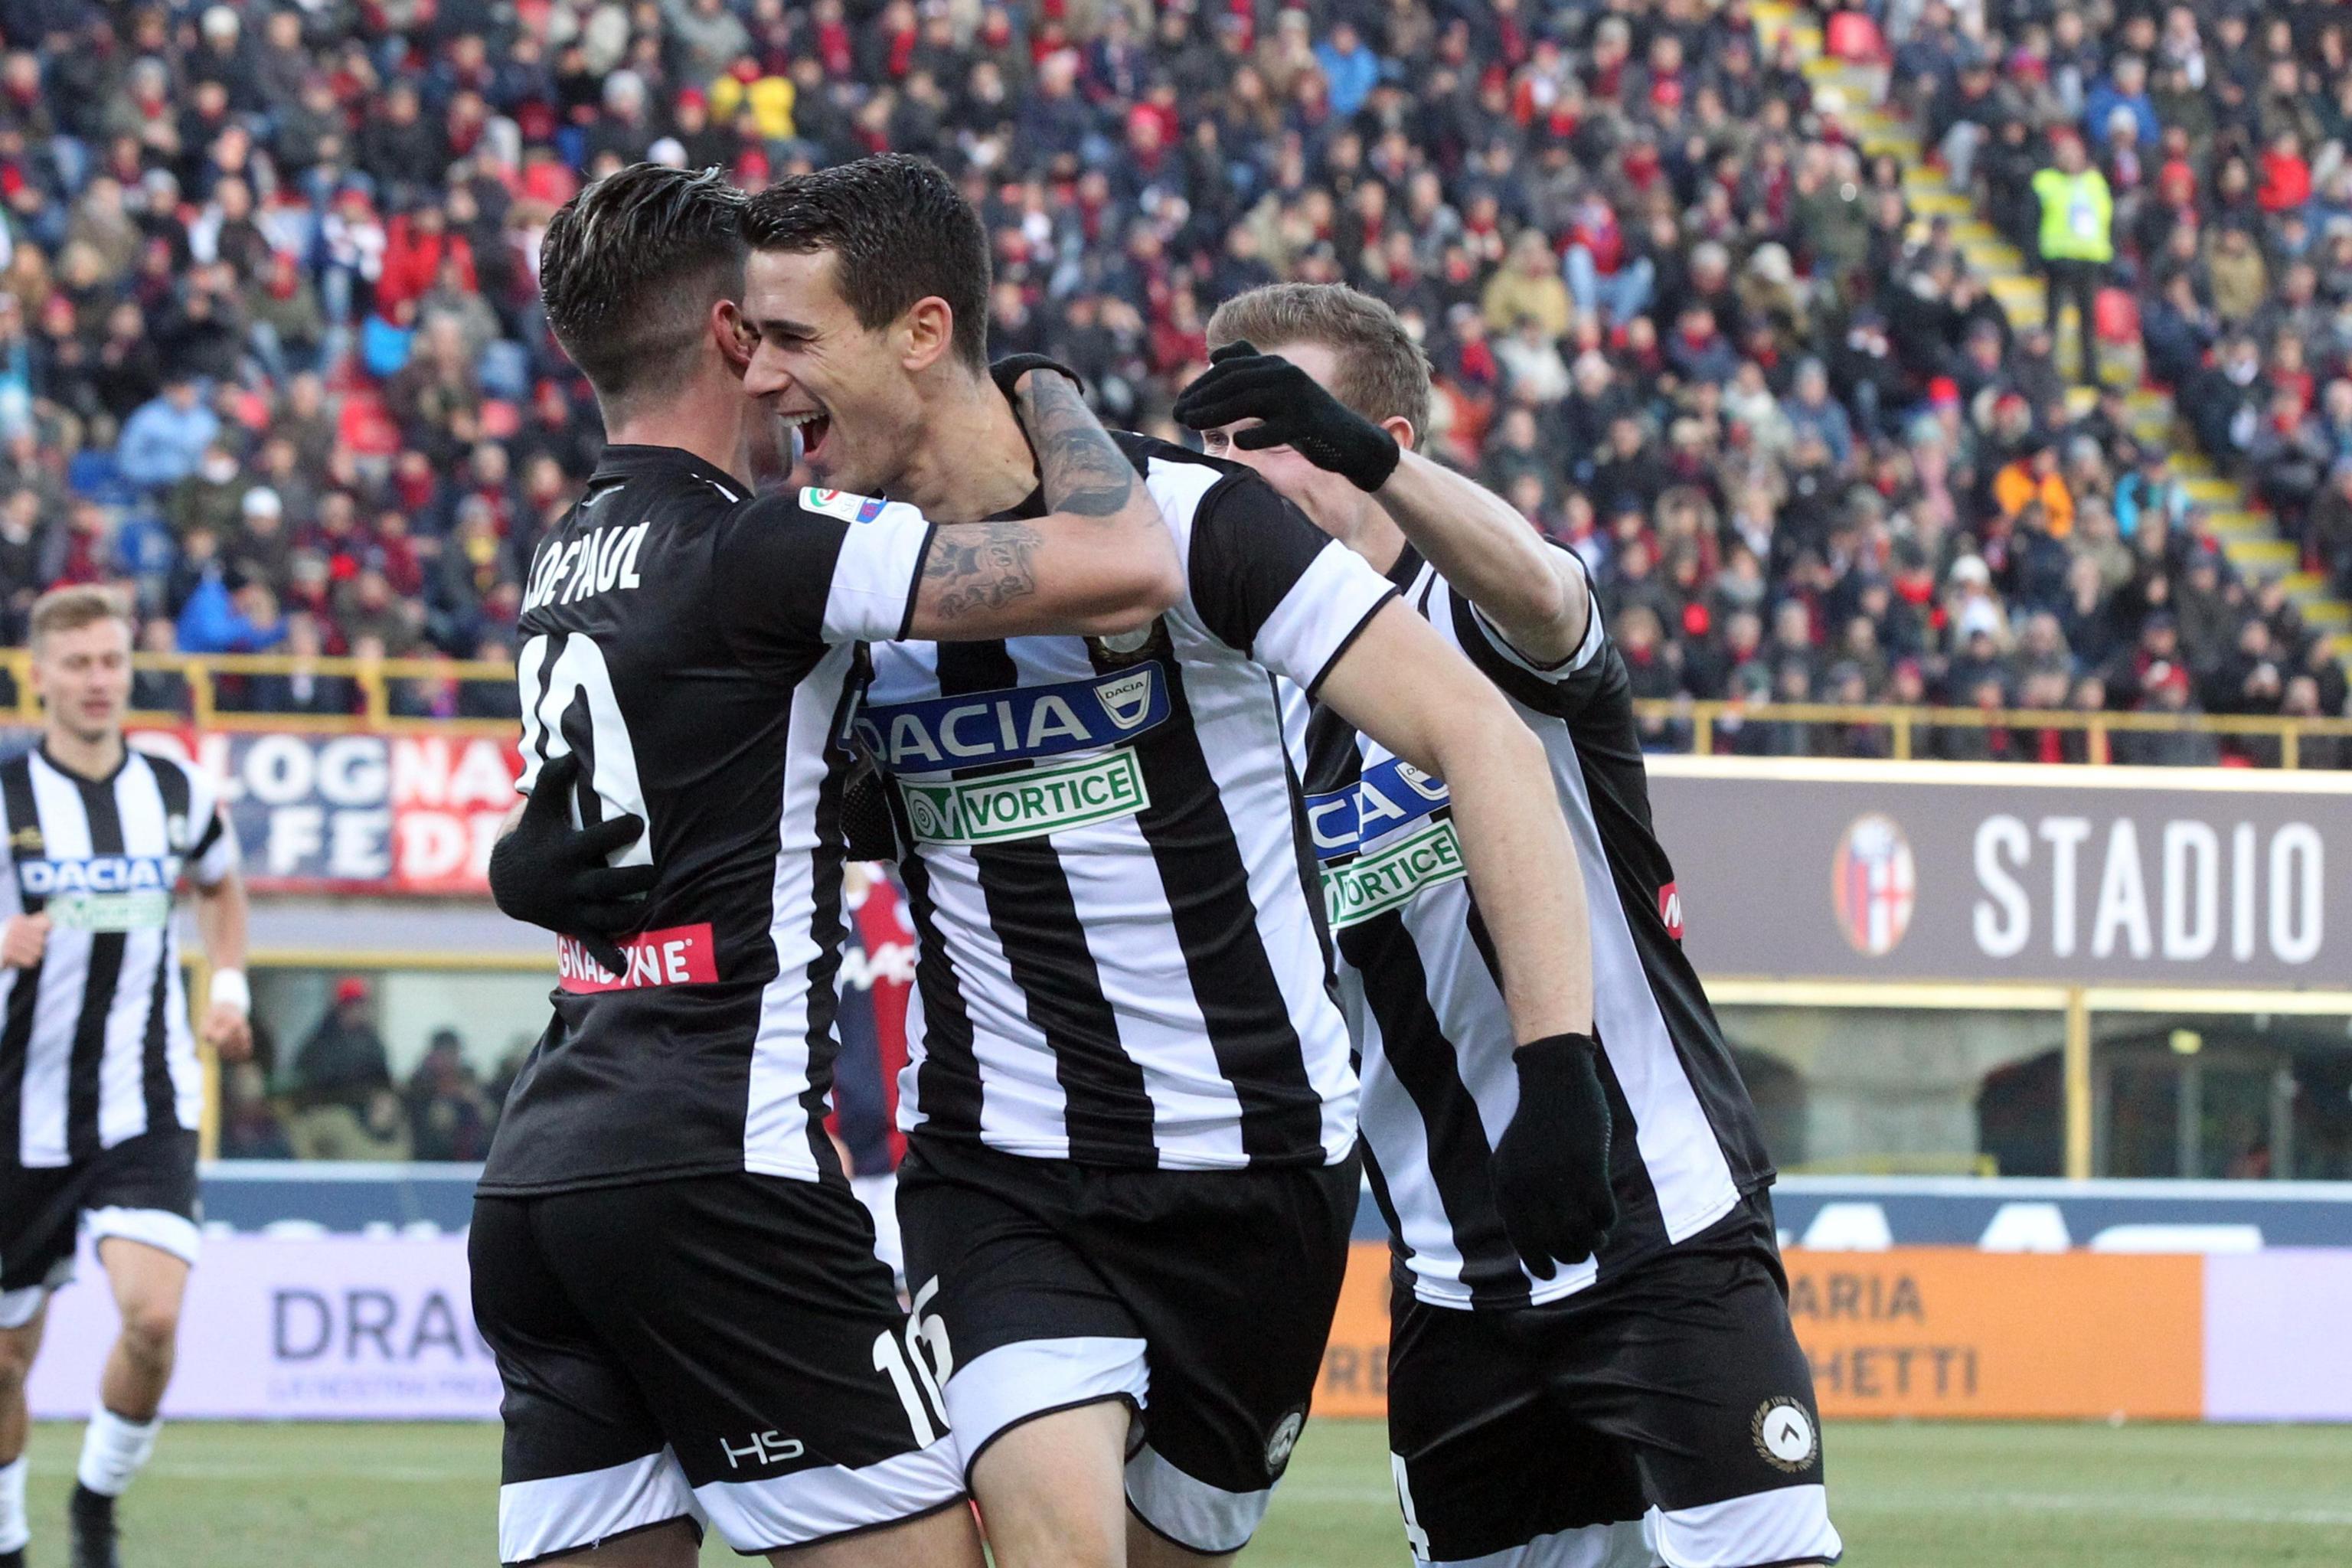 Serie A: Bologna-Udinese 1-2